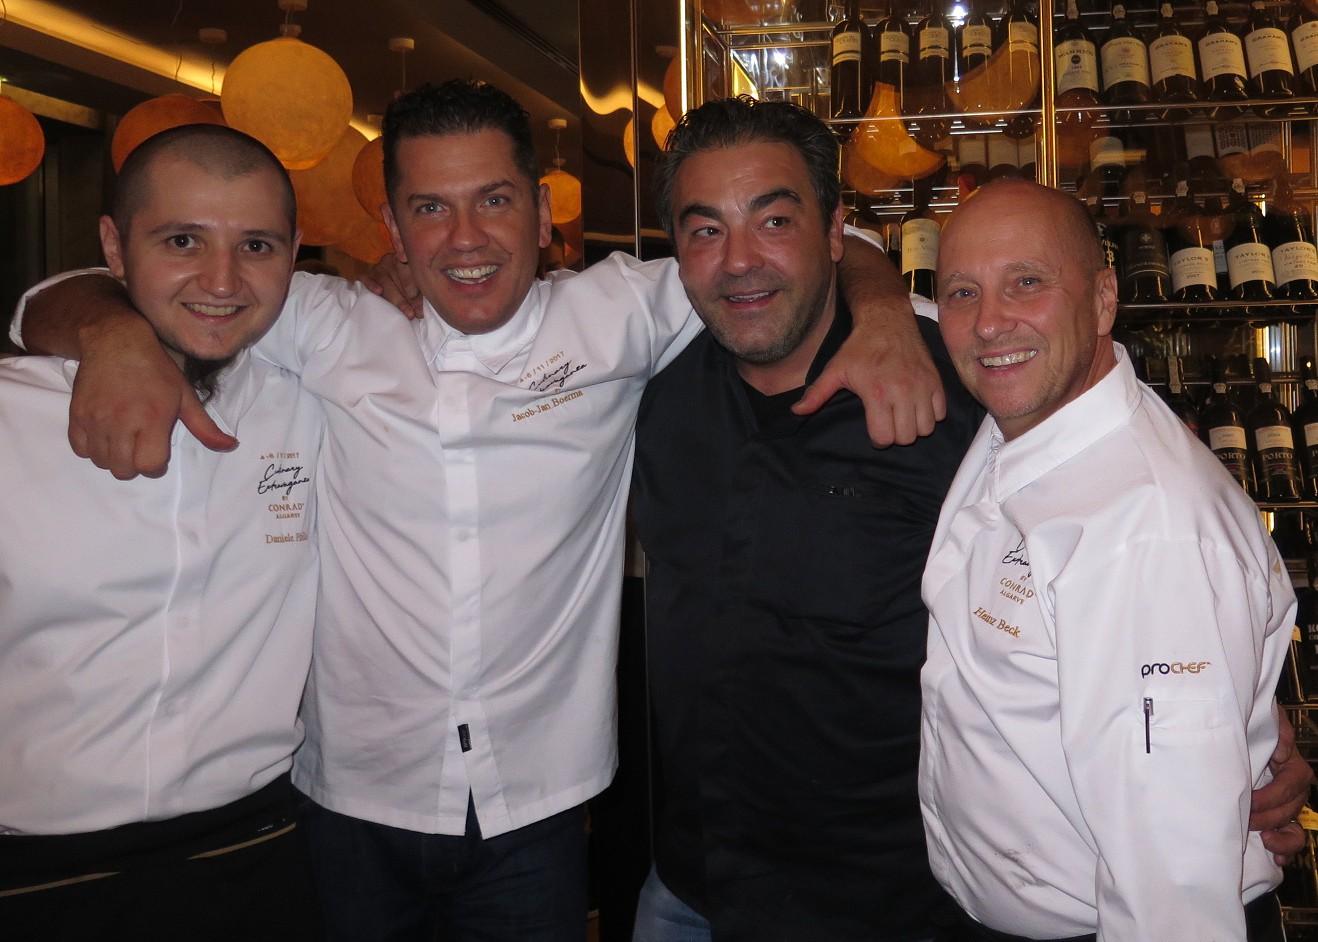 Daniele Pirillo (Executive Chef do GUSTO by Heinz Beck), Jacob Jan Boerma (chef do DE LEEST), Juan Amador (chef do AMADOR'S WIRTSHAUS) e Heinz Beck (chef do LA PERGOLA)